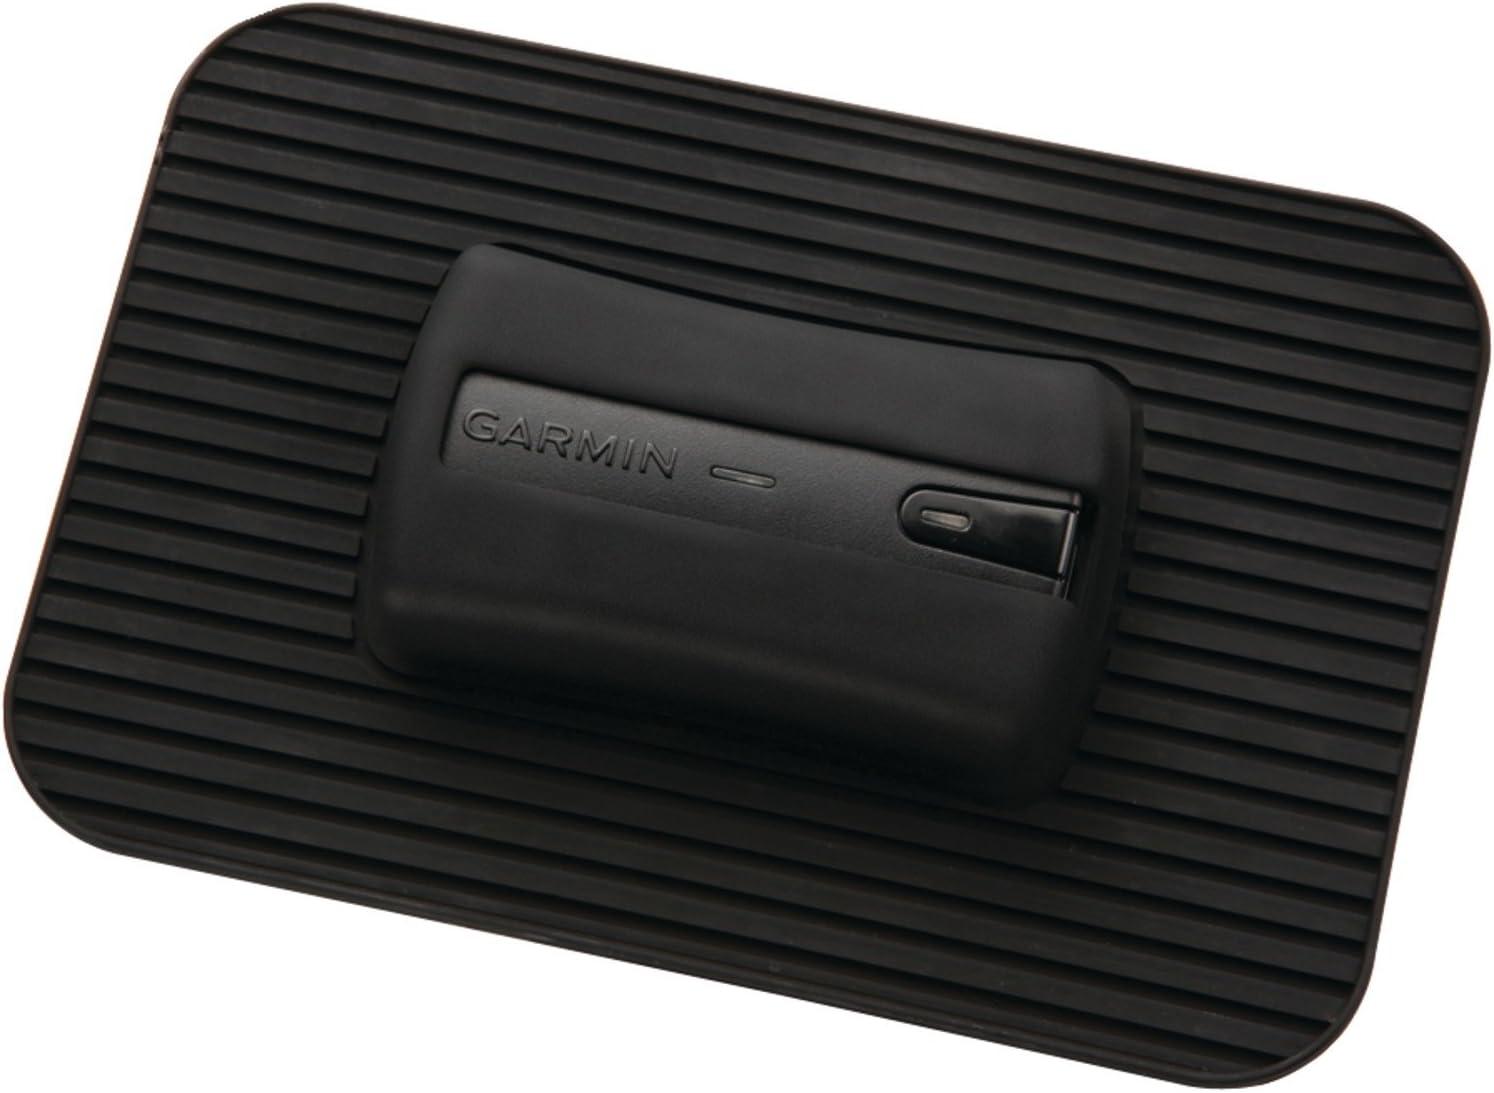 Garmin - Soporte antideslizante para GPS